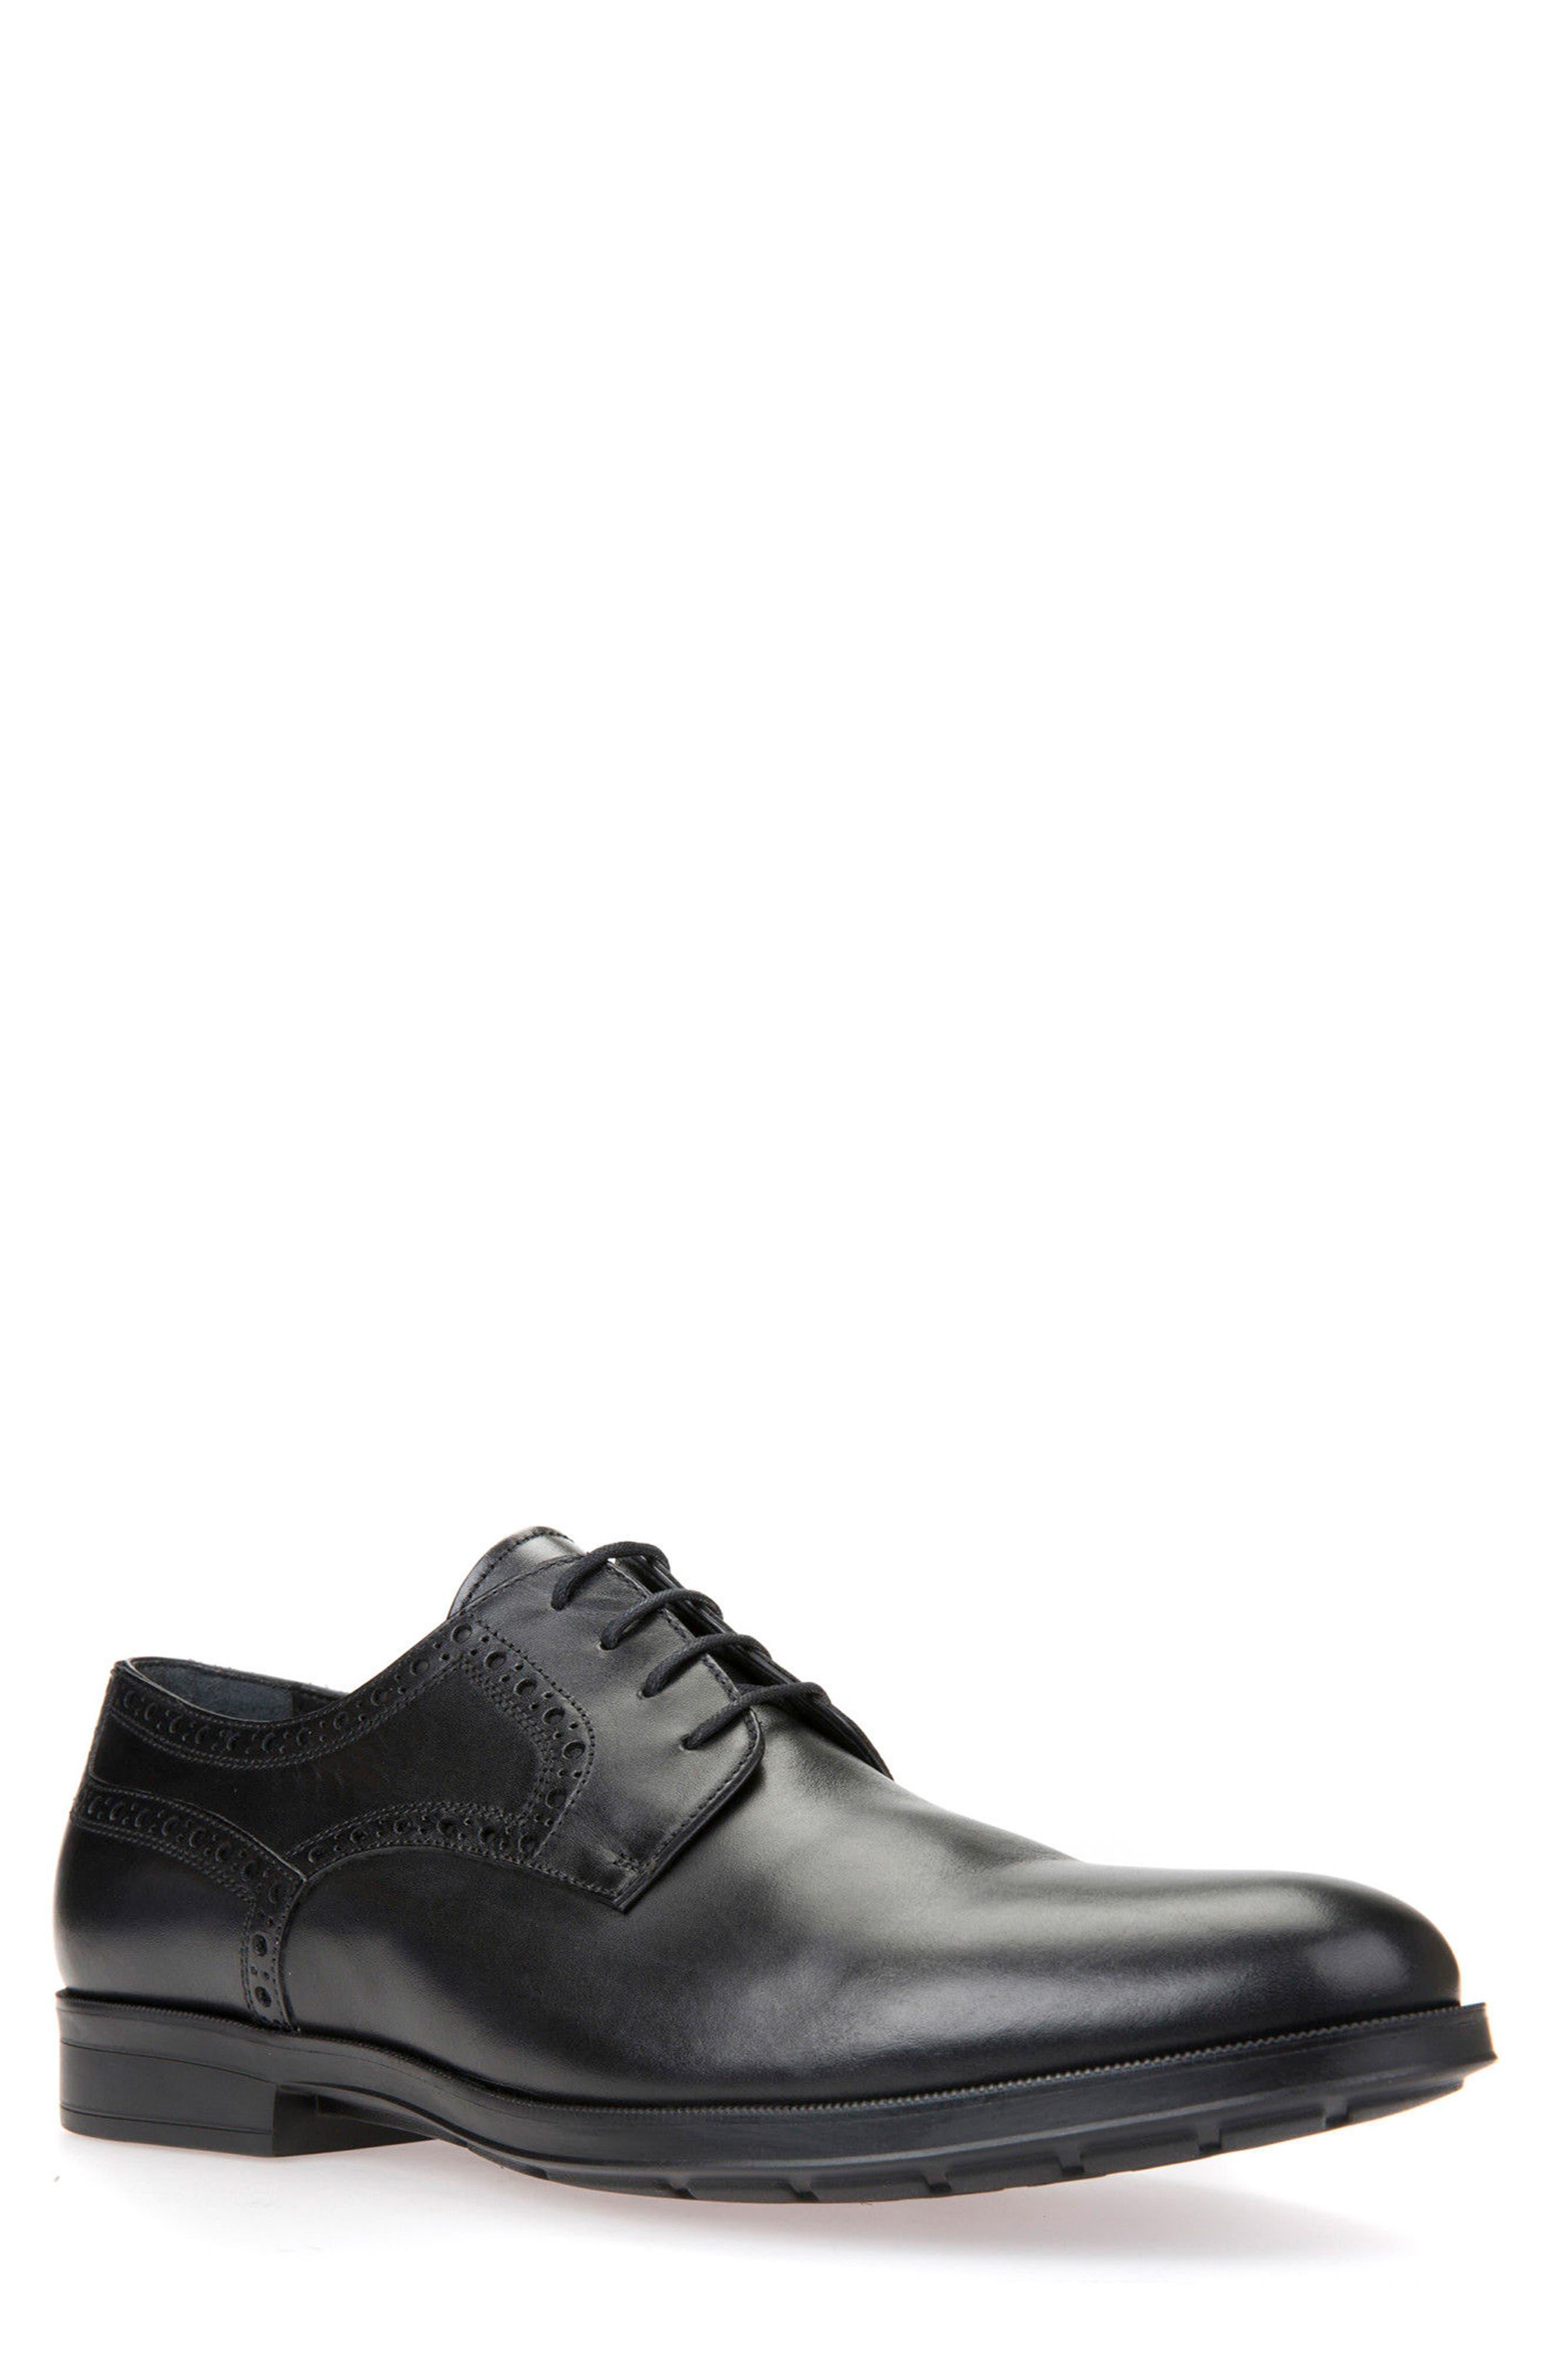 GEOX, Hilstone 3 Plain Toe Derby, Main thumbnail 1, color, BLACK LEATHER